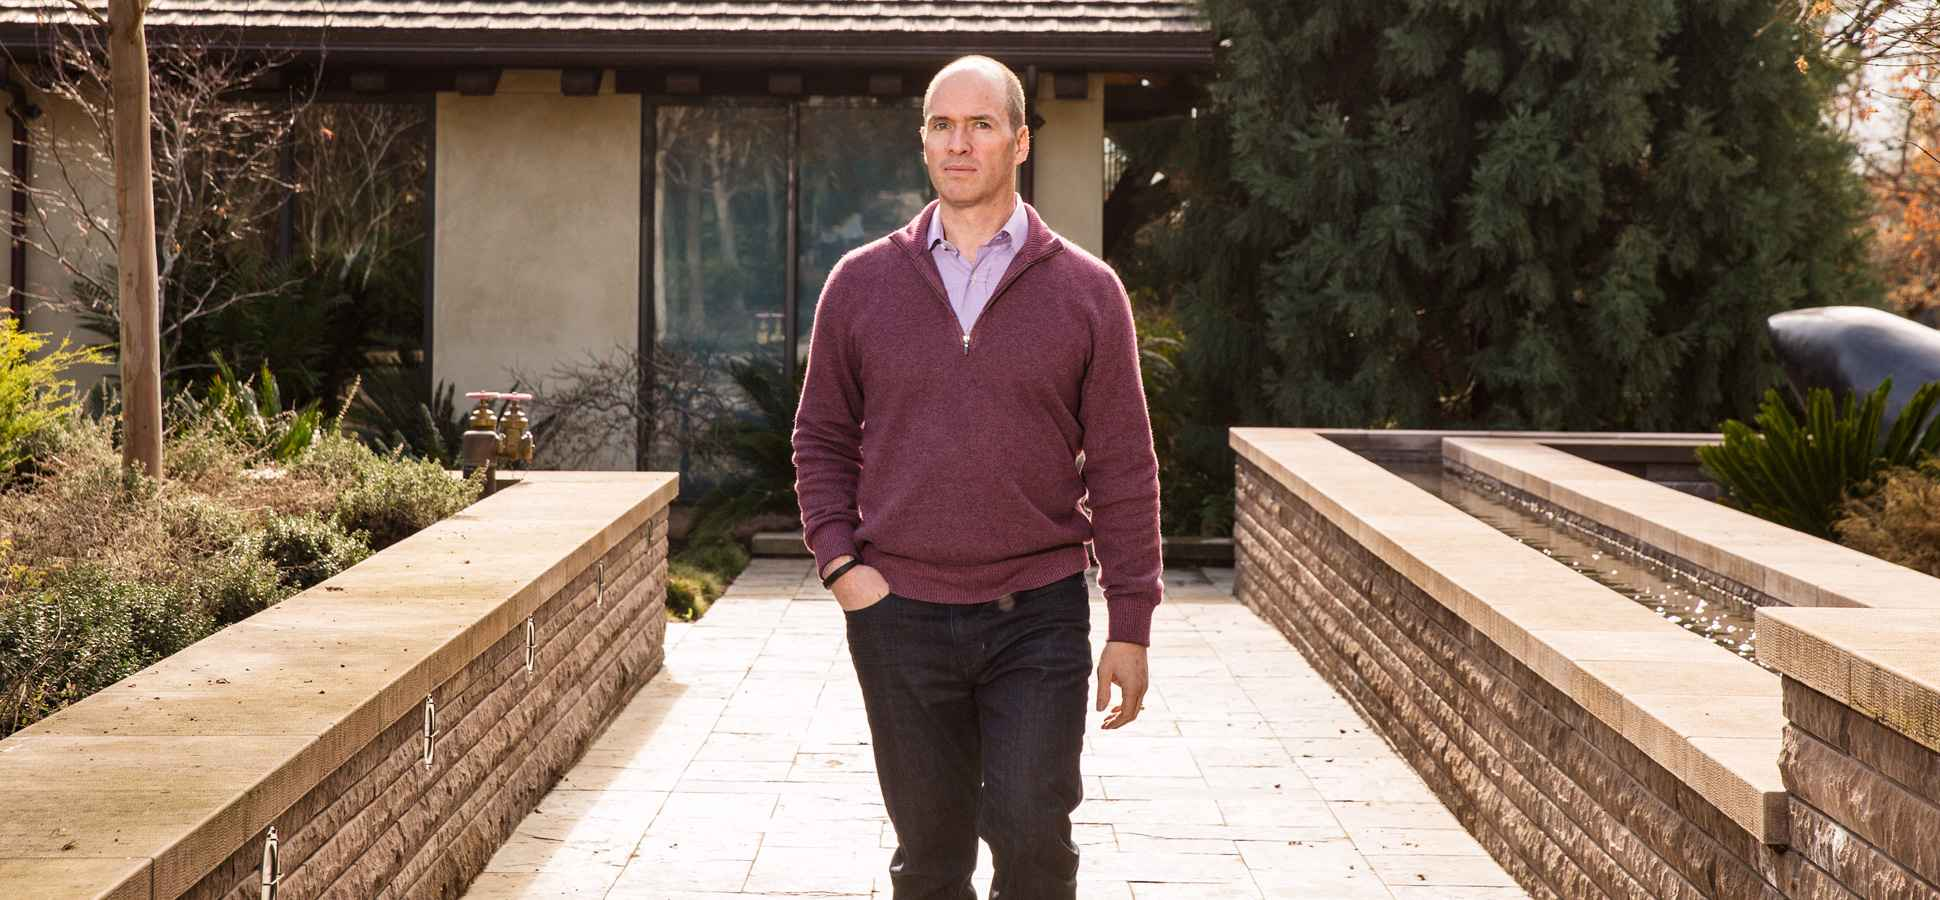 Ben Horowitz to Startup CEOs: This Won't Be Easy